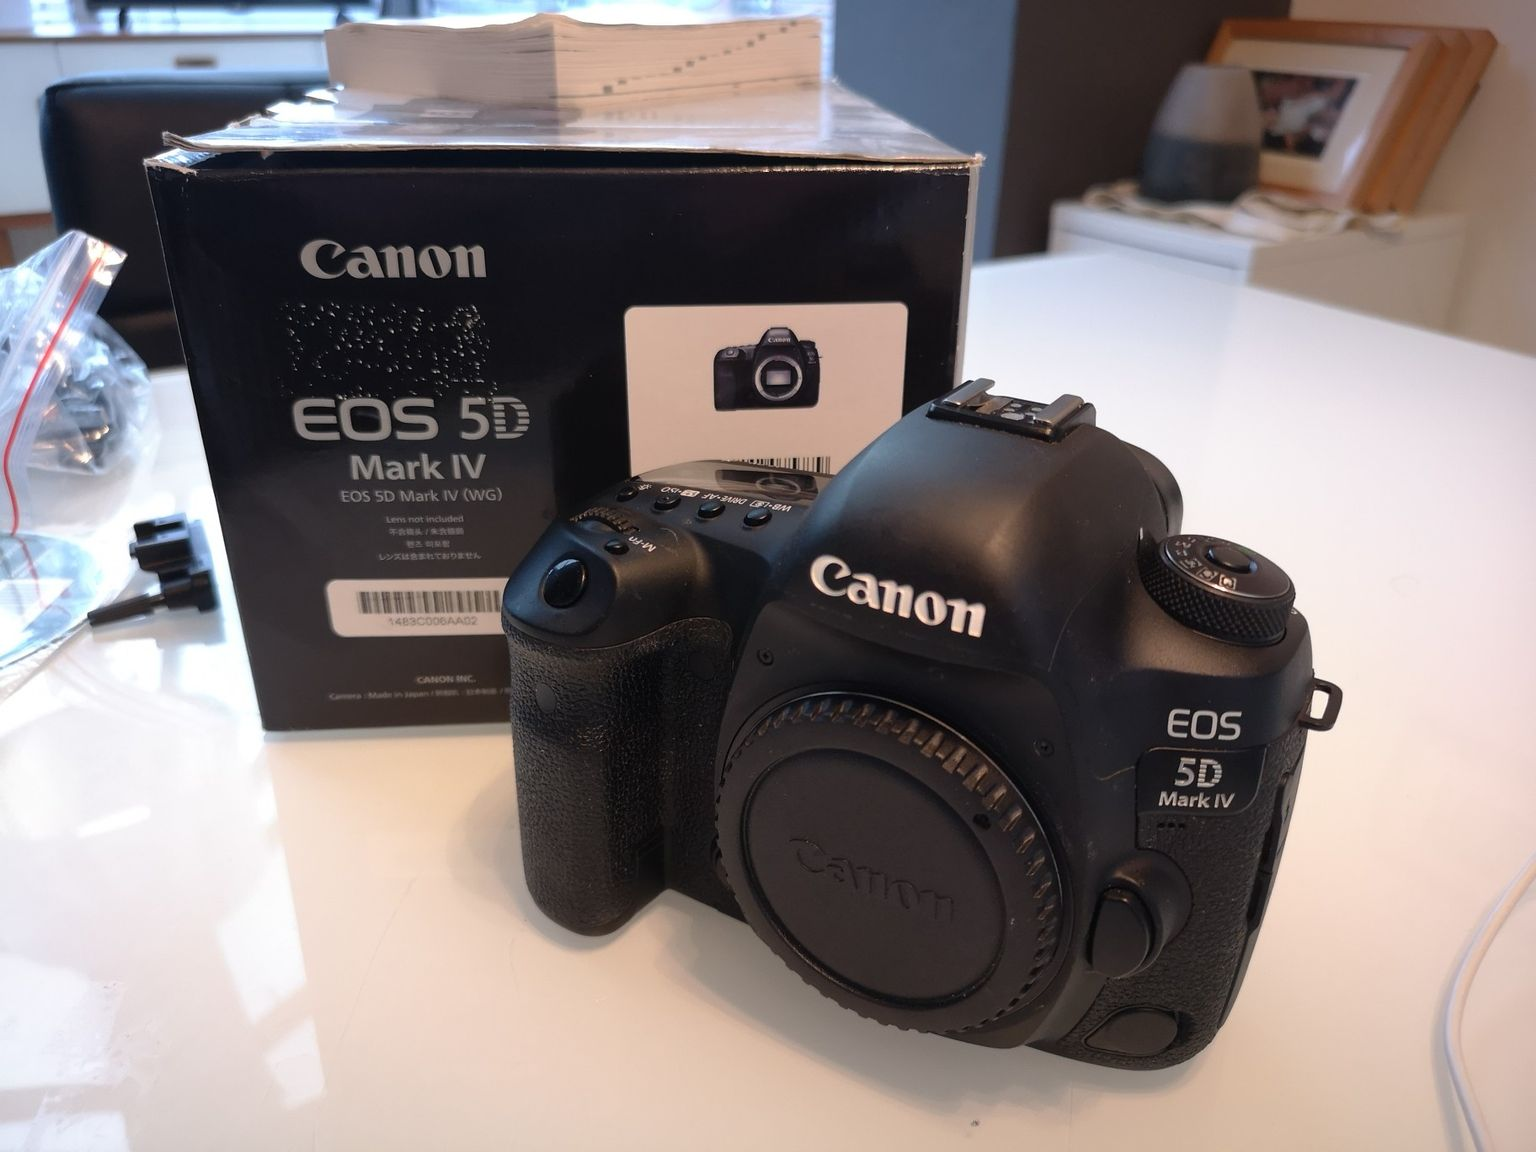 Canon EOS 90D, CANON 850D ,Canon 5D Mark IV, Canon 5DS,Canon 6D Mark II, Canon EOS R, Nikon D850, Nikon D750